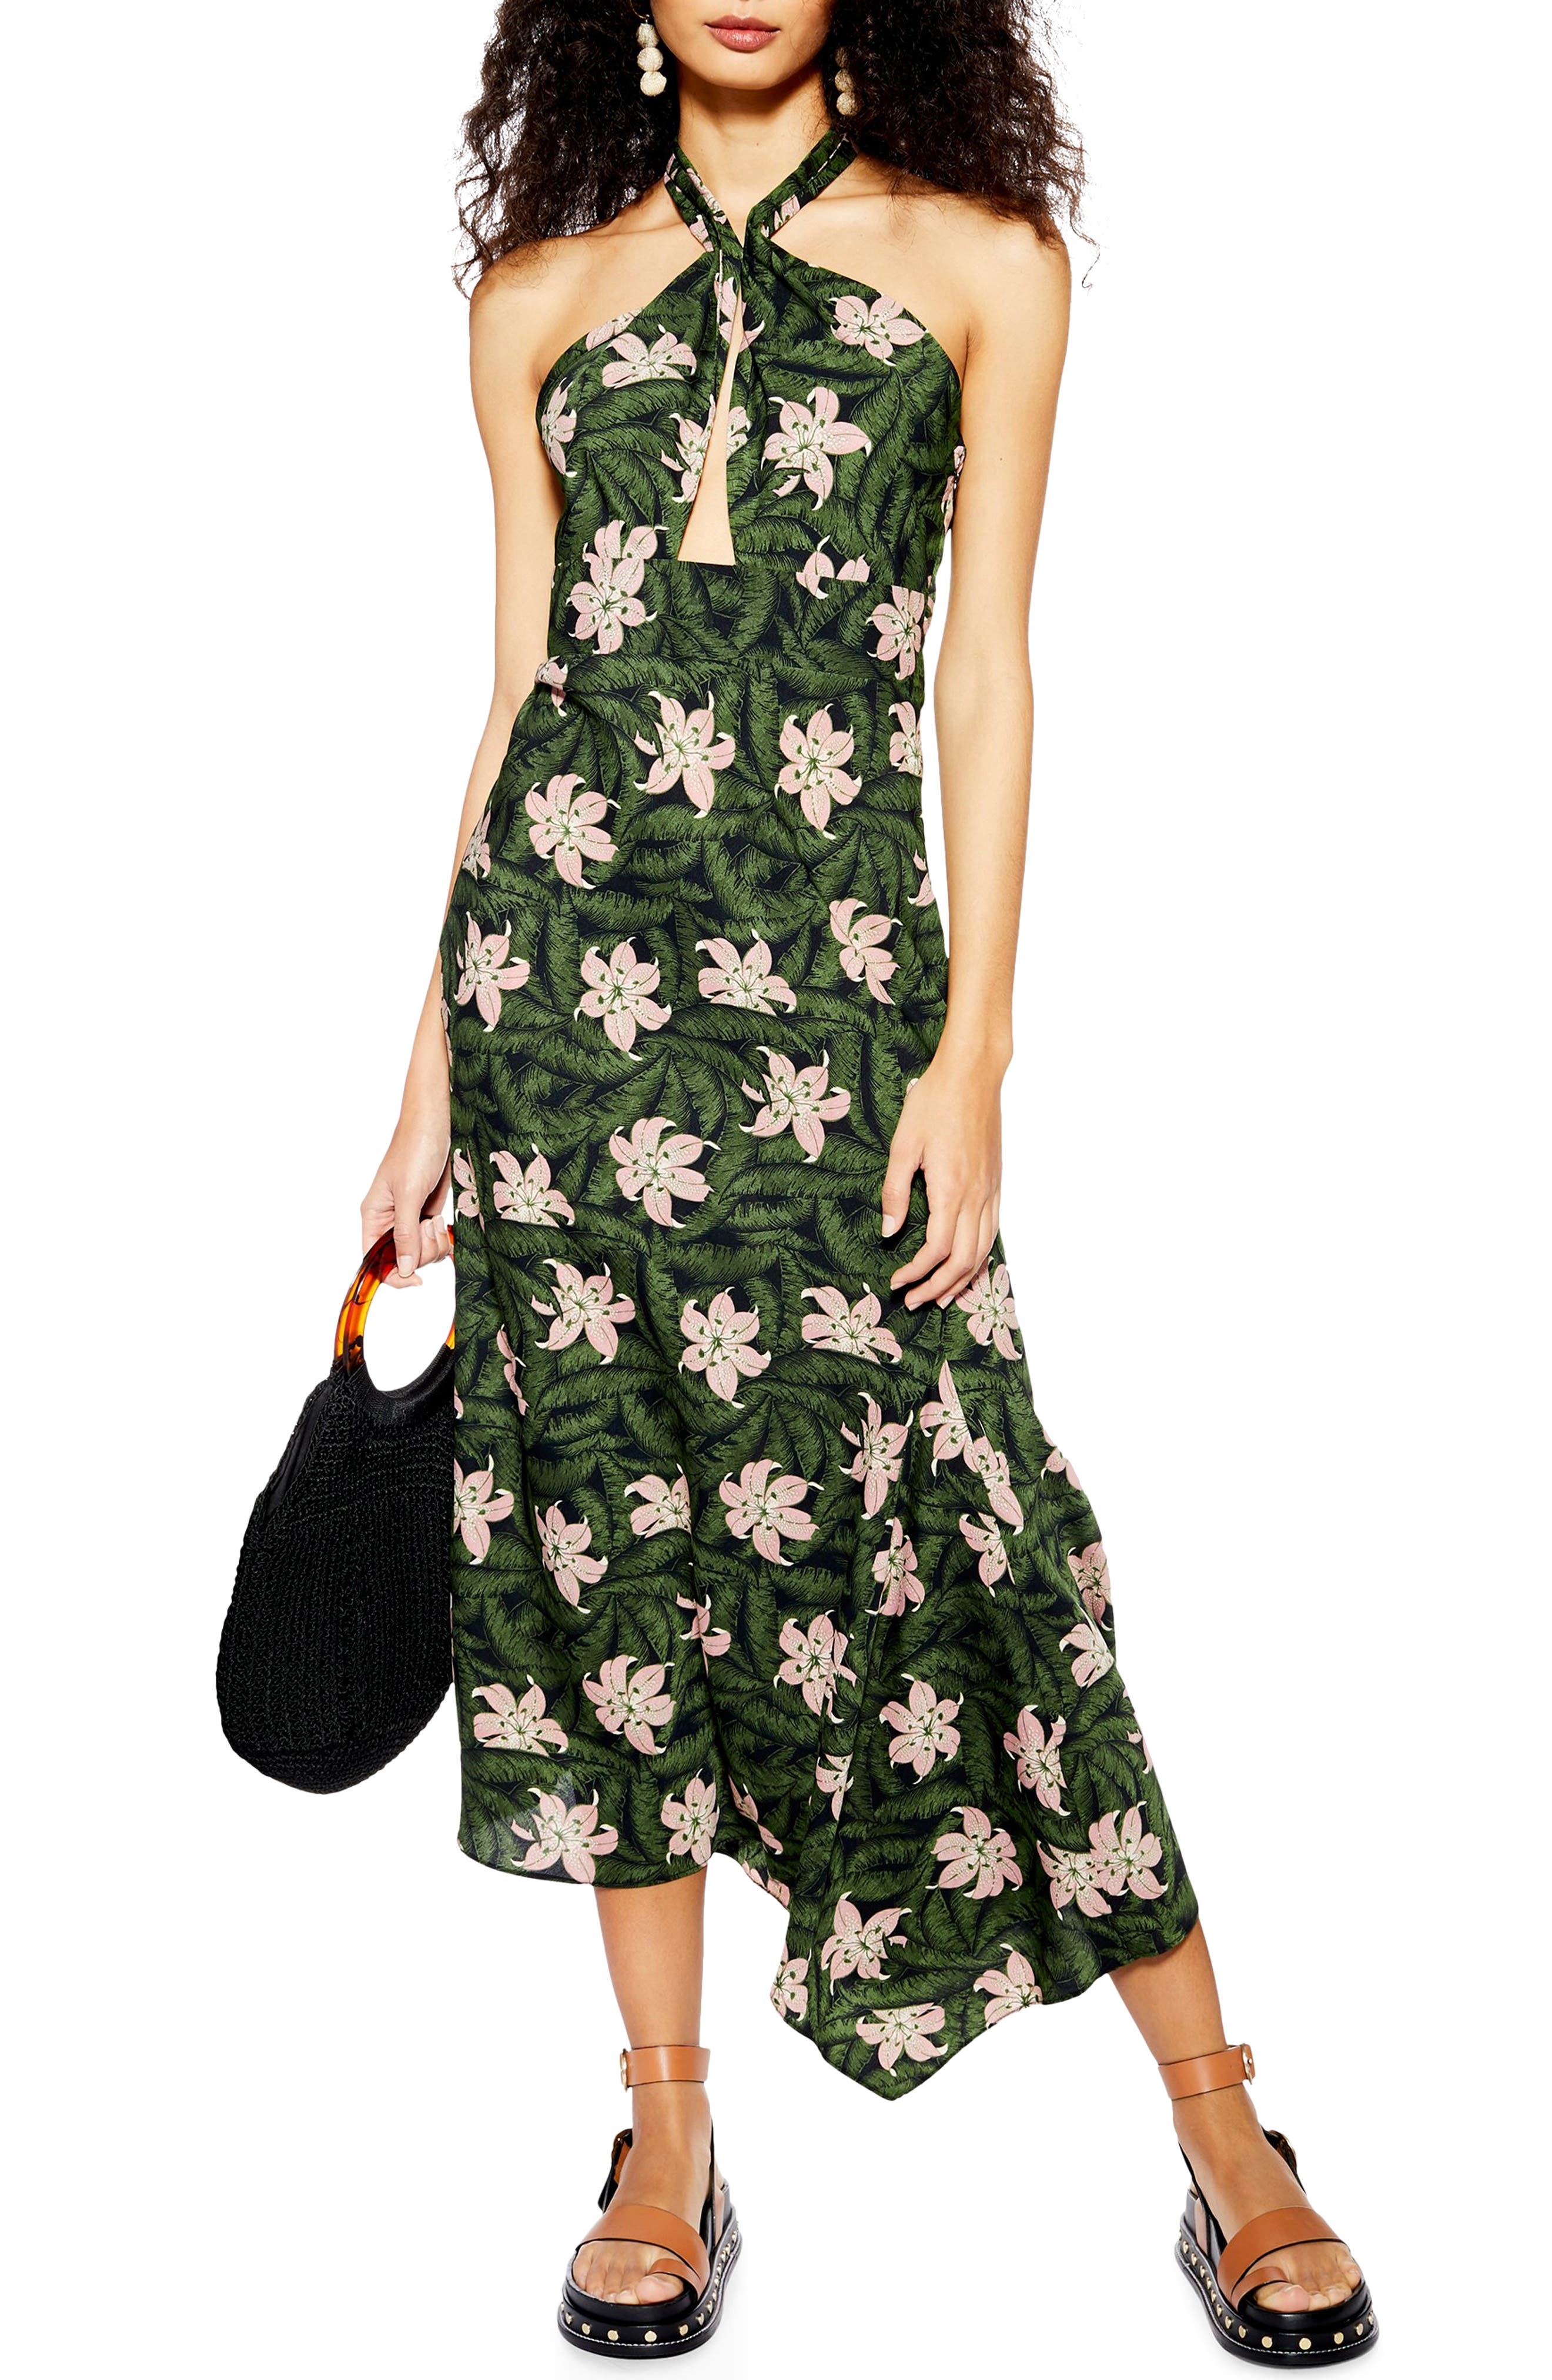 Topshop Hibiscus Halter Midi Dress, US (fits like 6-8) - Green